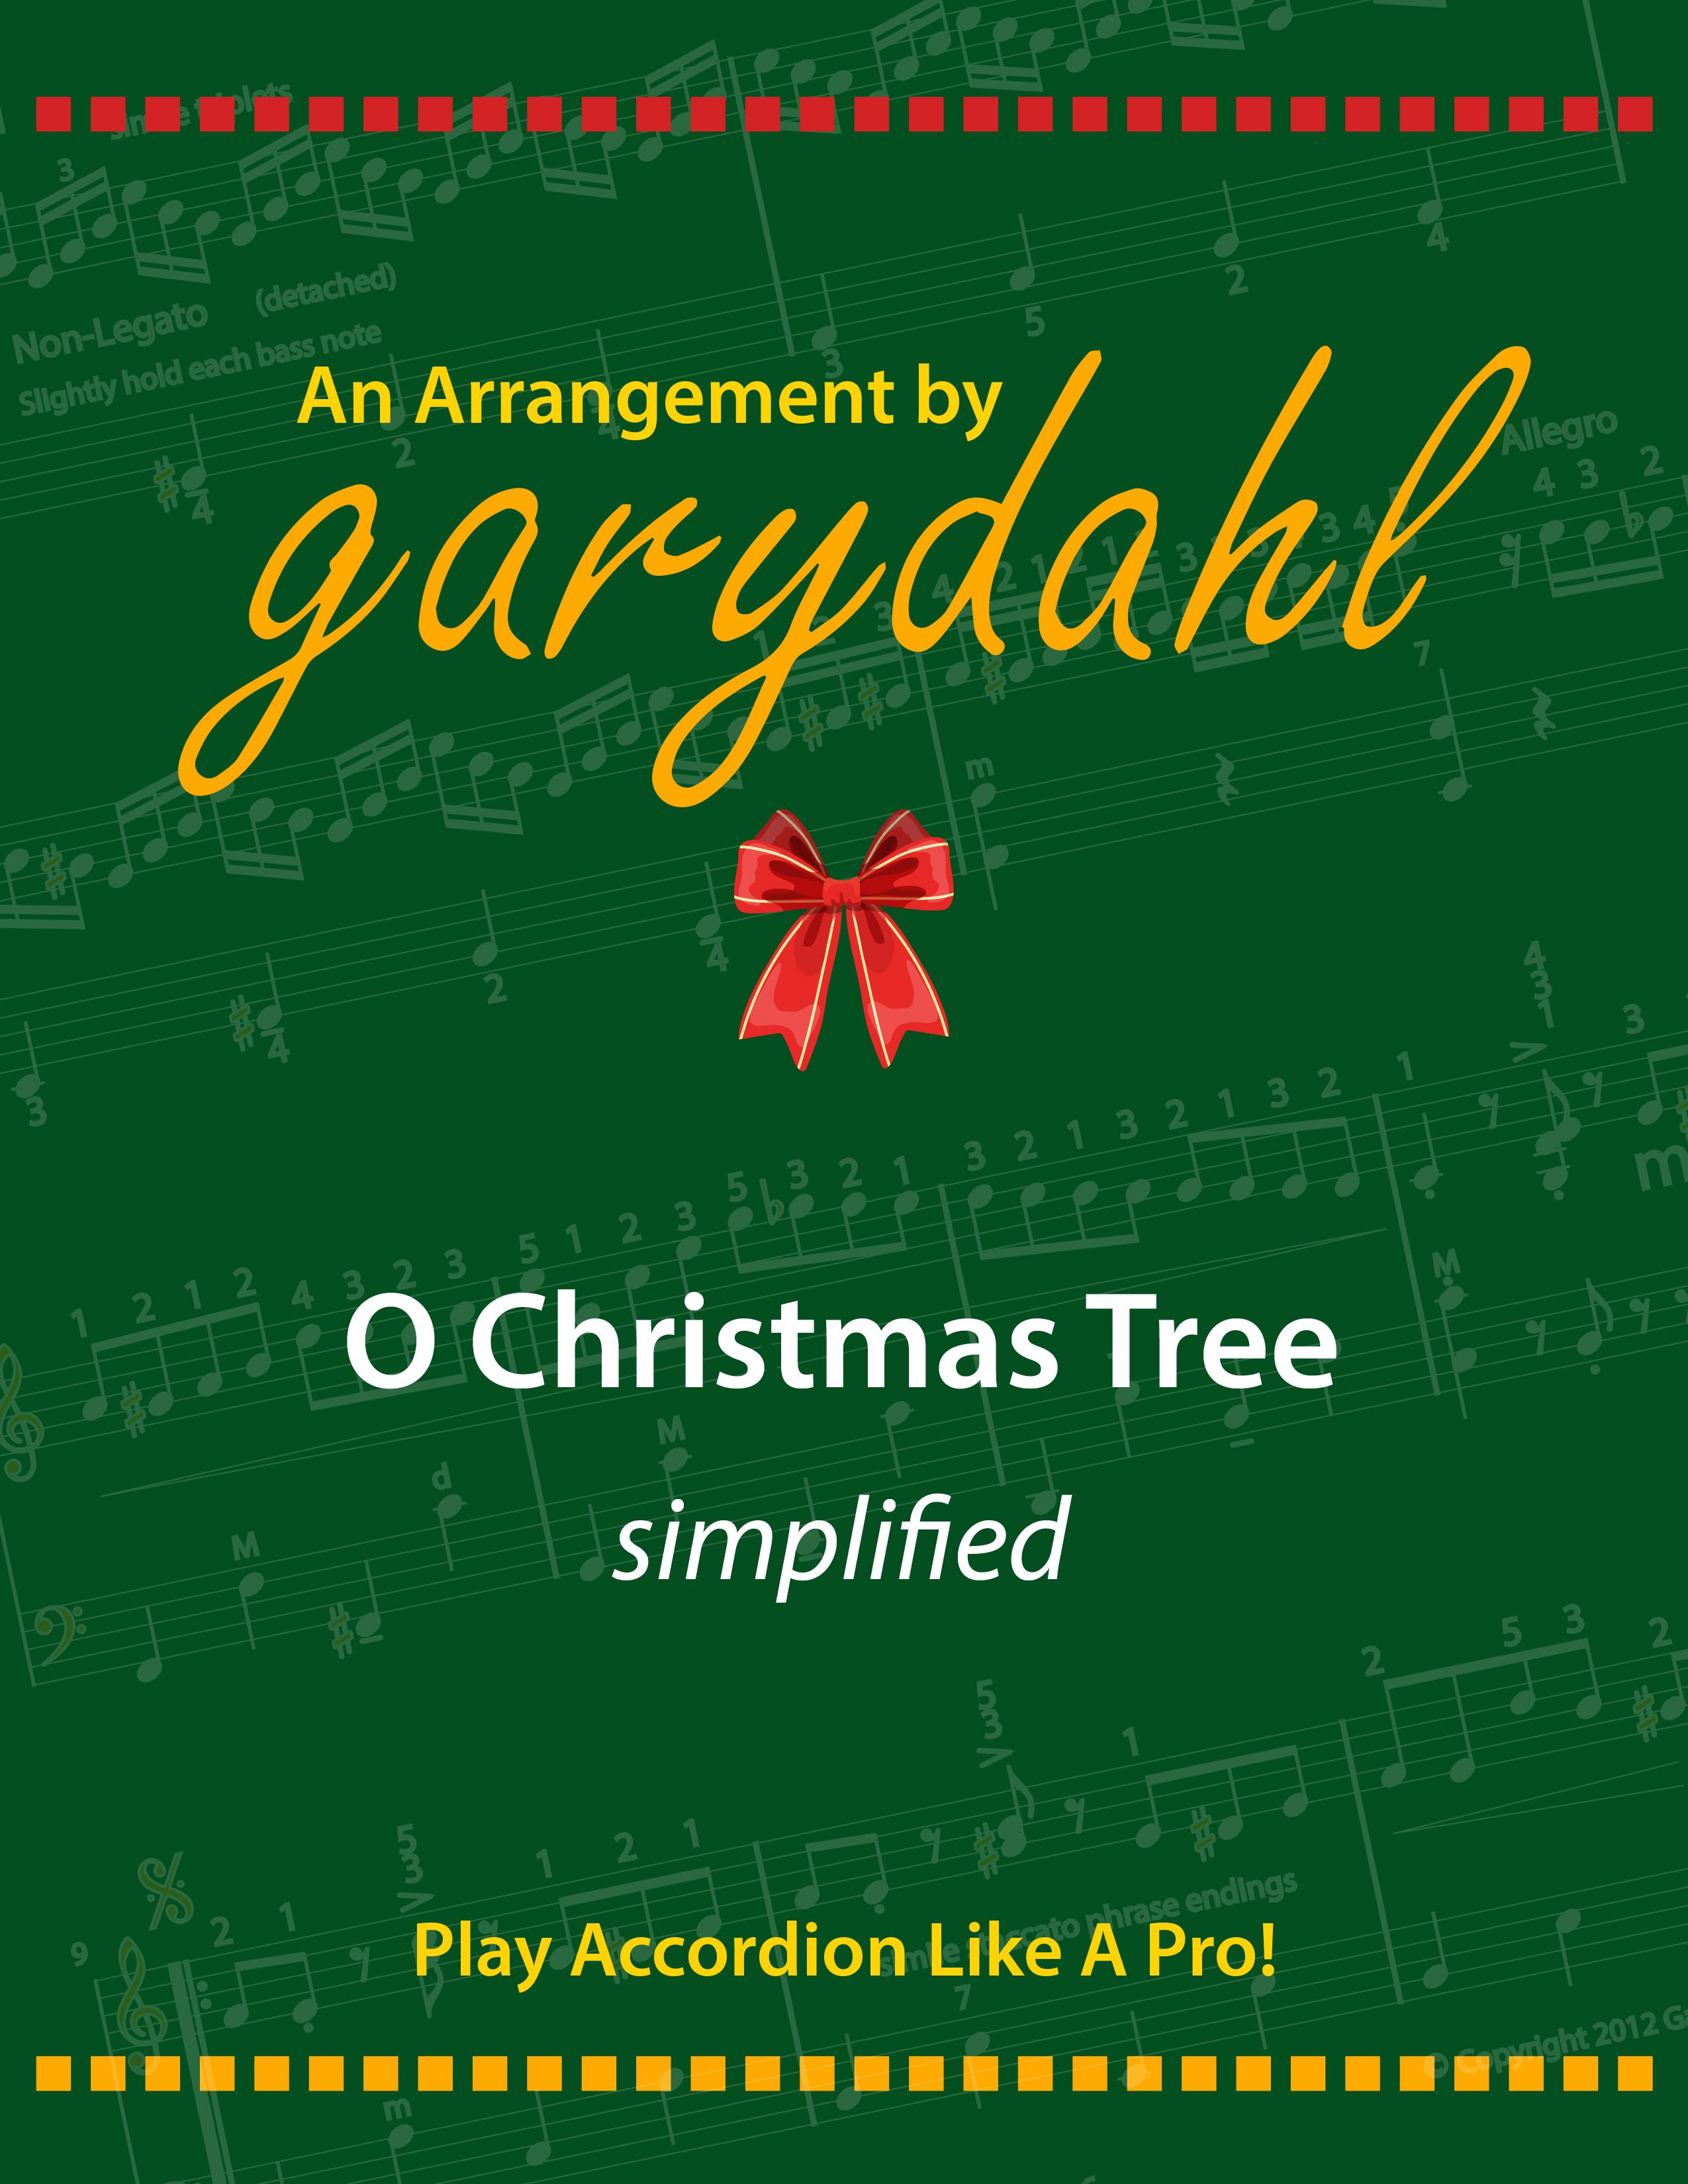 Accordion Sheet Music: O Christmas Tree • AccordionLife.com